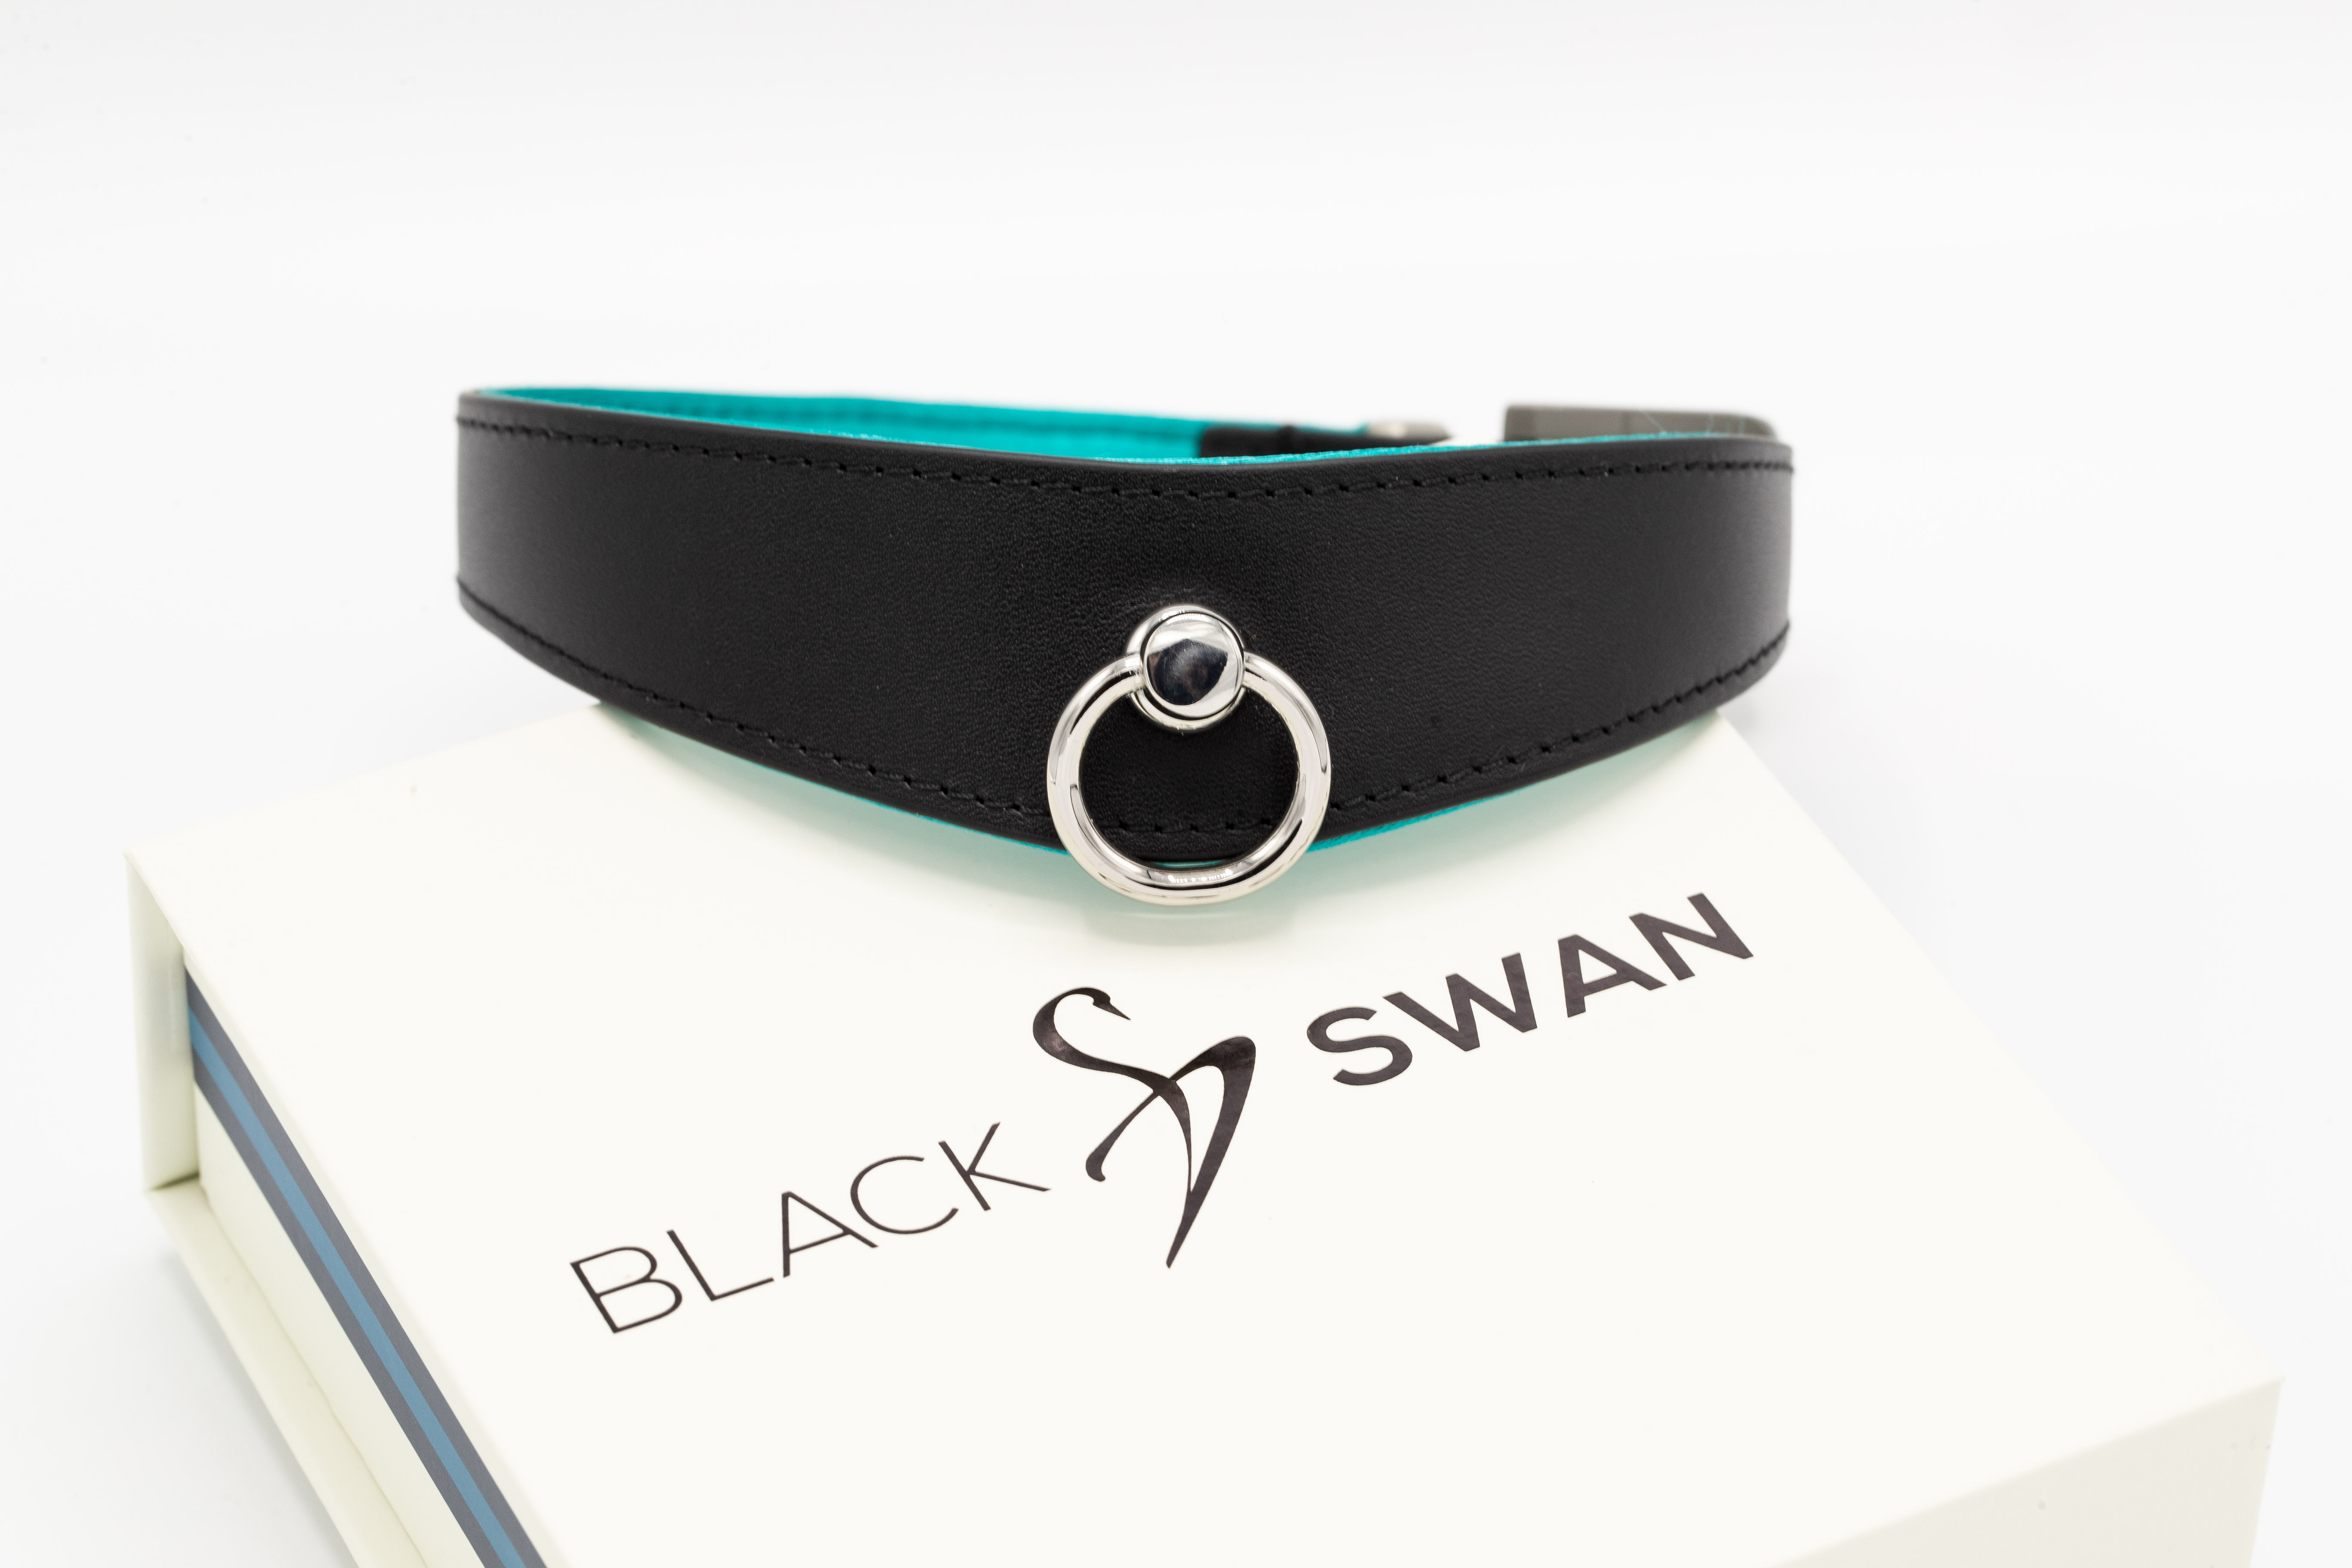 Black Swan COLLAR Black Ice